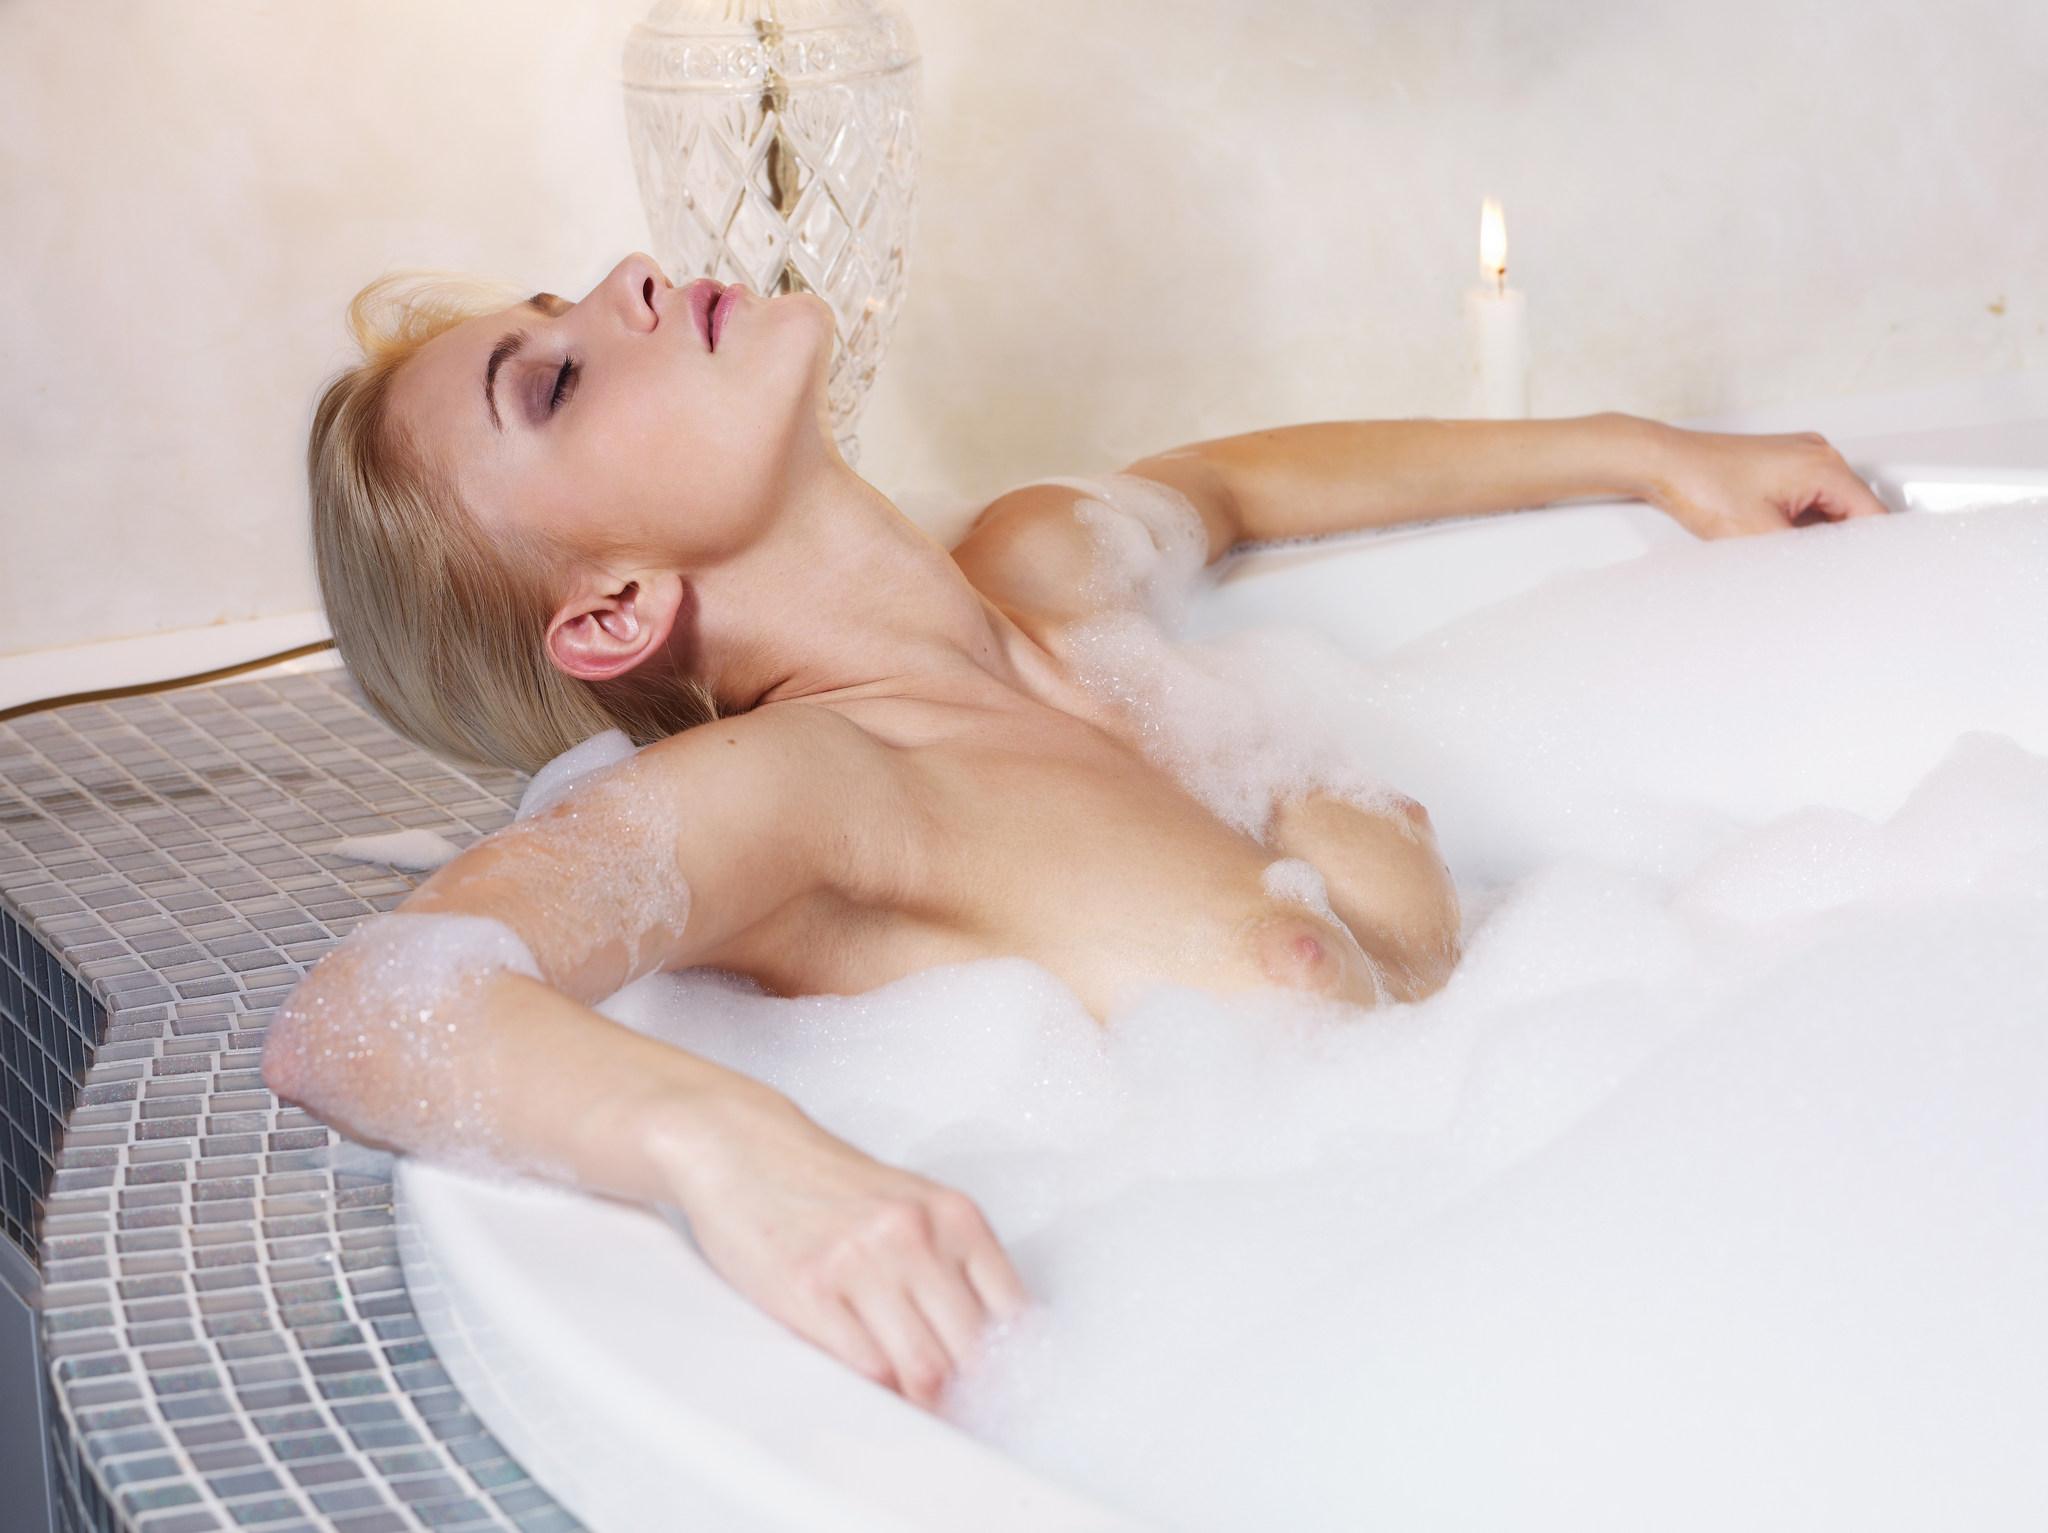 naked-girls-taking-bath-boobs-wet-mix-vol4-01